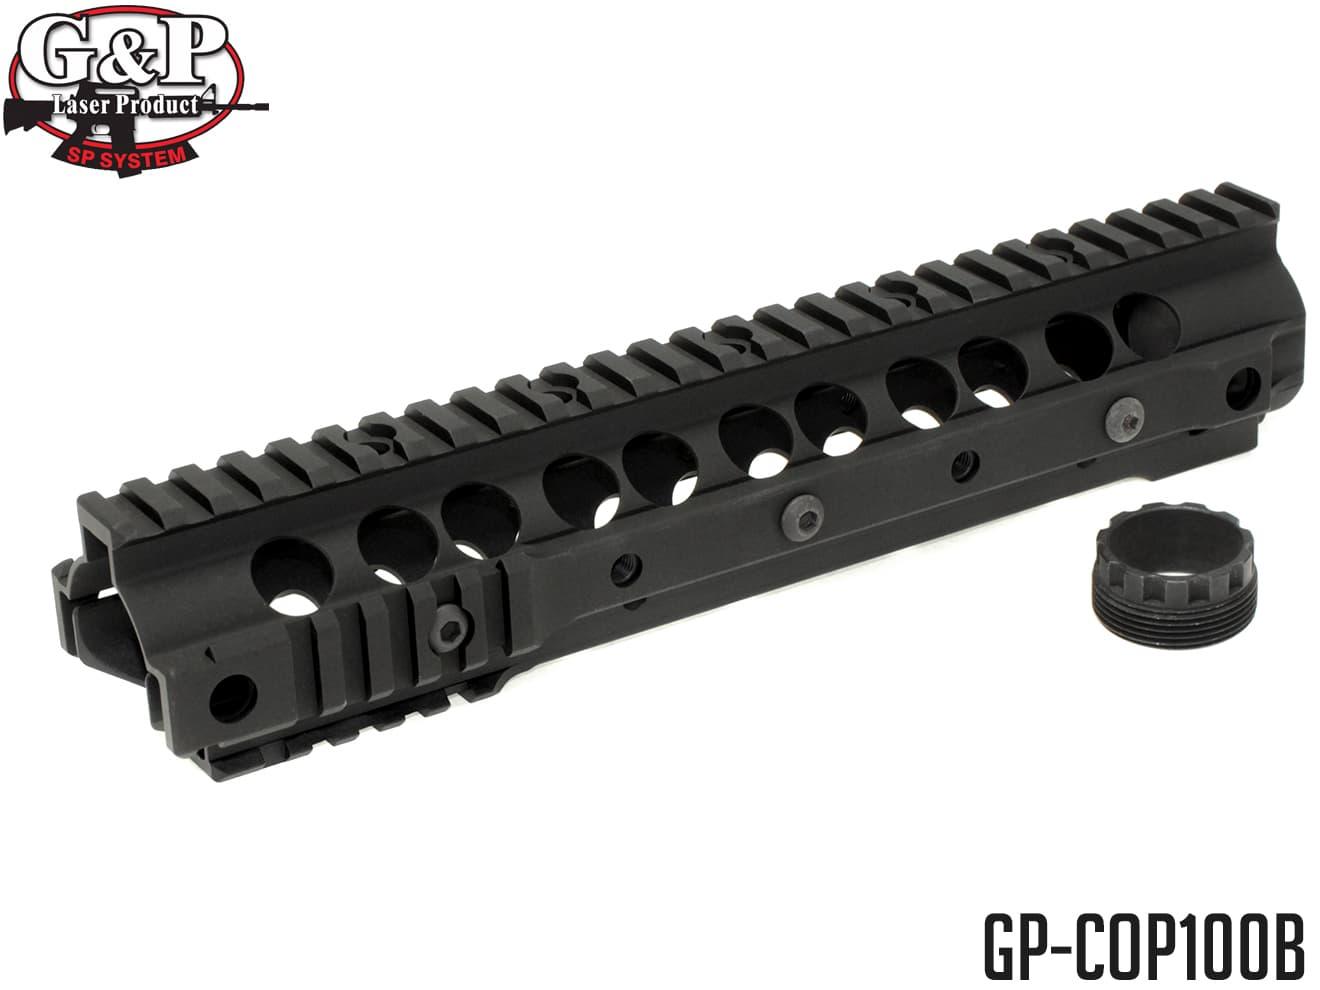 G&P URX III RAS (Medium) for マルイ M4◆ナイツタイプ KSC 電動 ガス対応 M4シリーズ Knight's KAC 10.5インチ相当 MARSOC ナイツ KSC G&P アルミ製 米軍